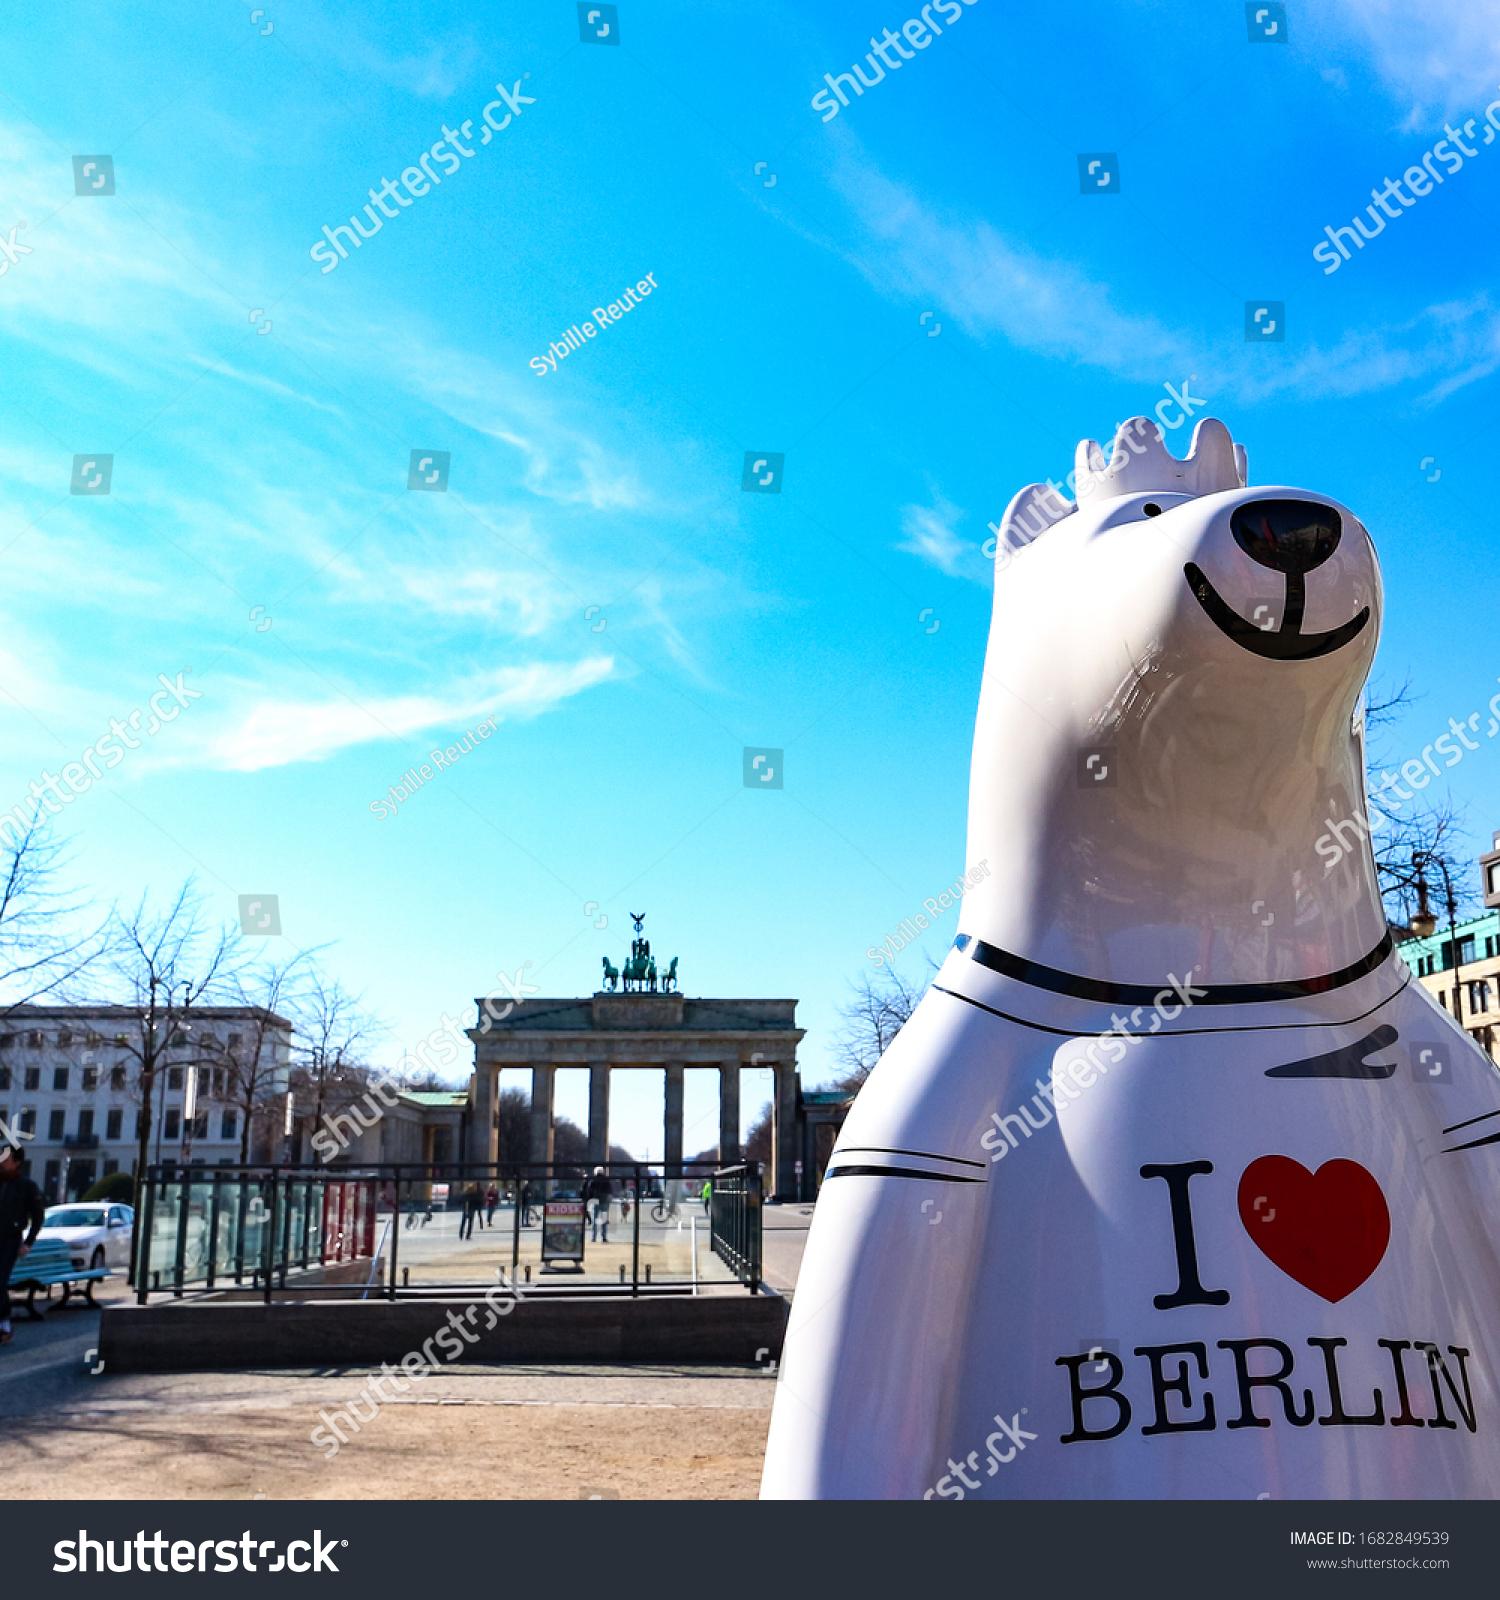 stock-photo-berlin-germany-march-bear-sc